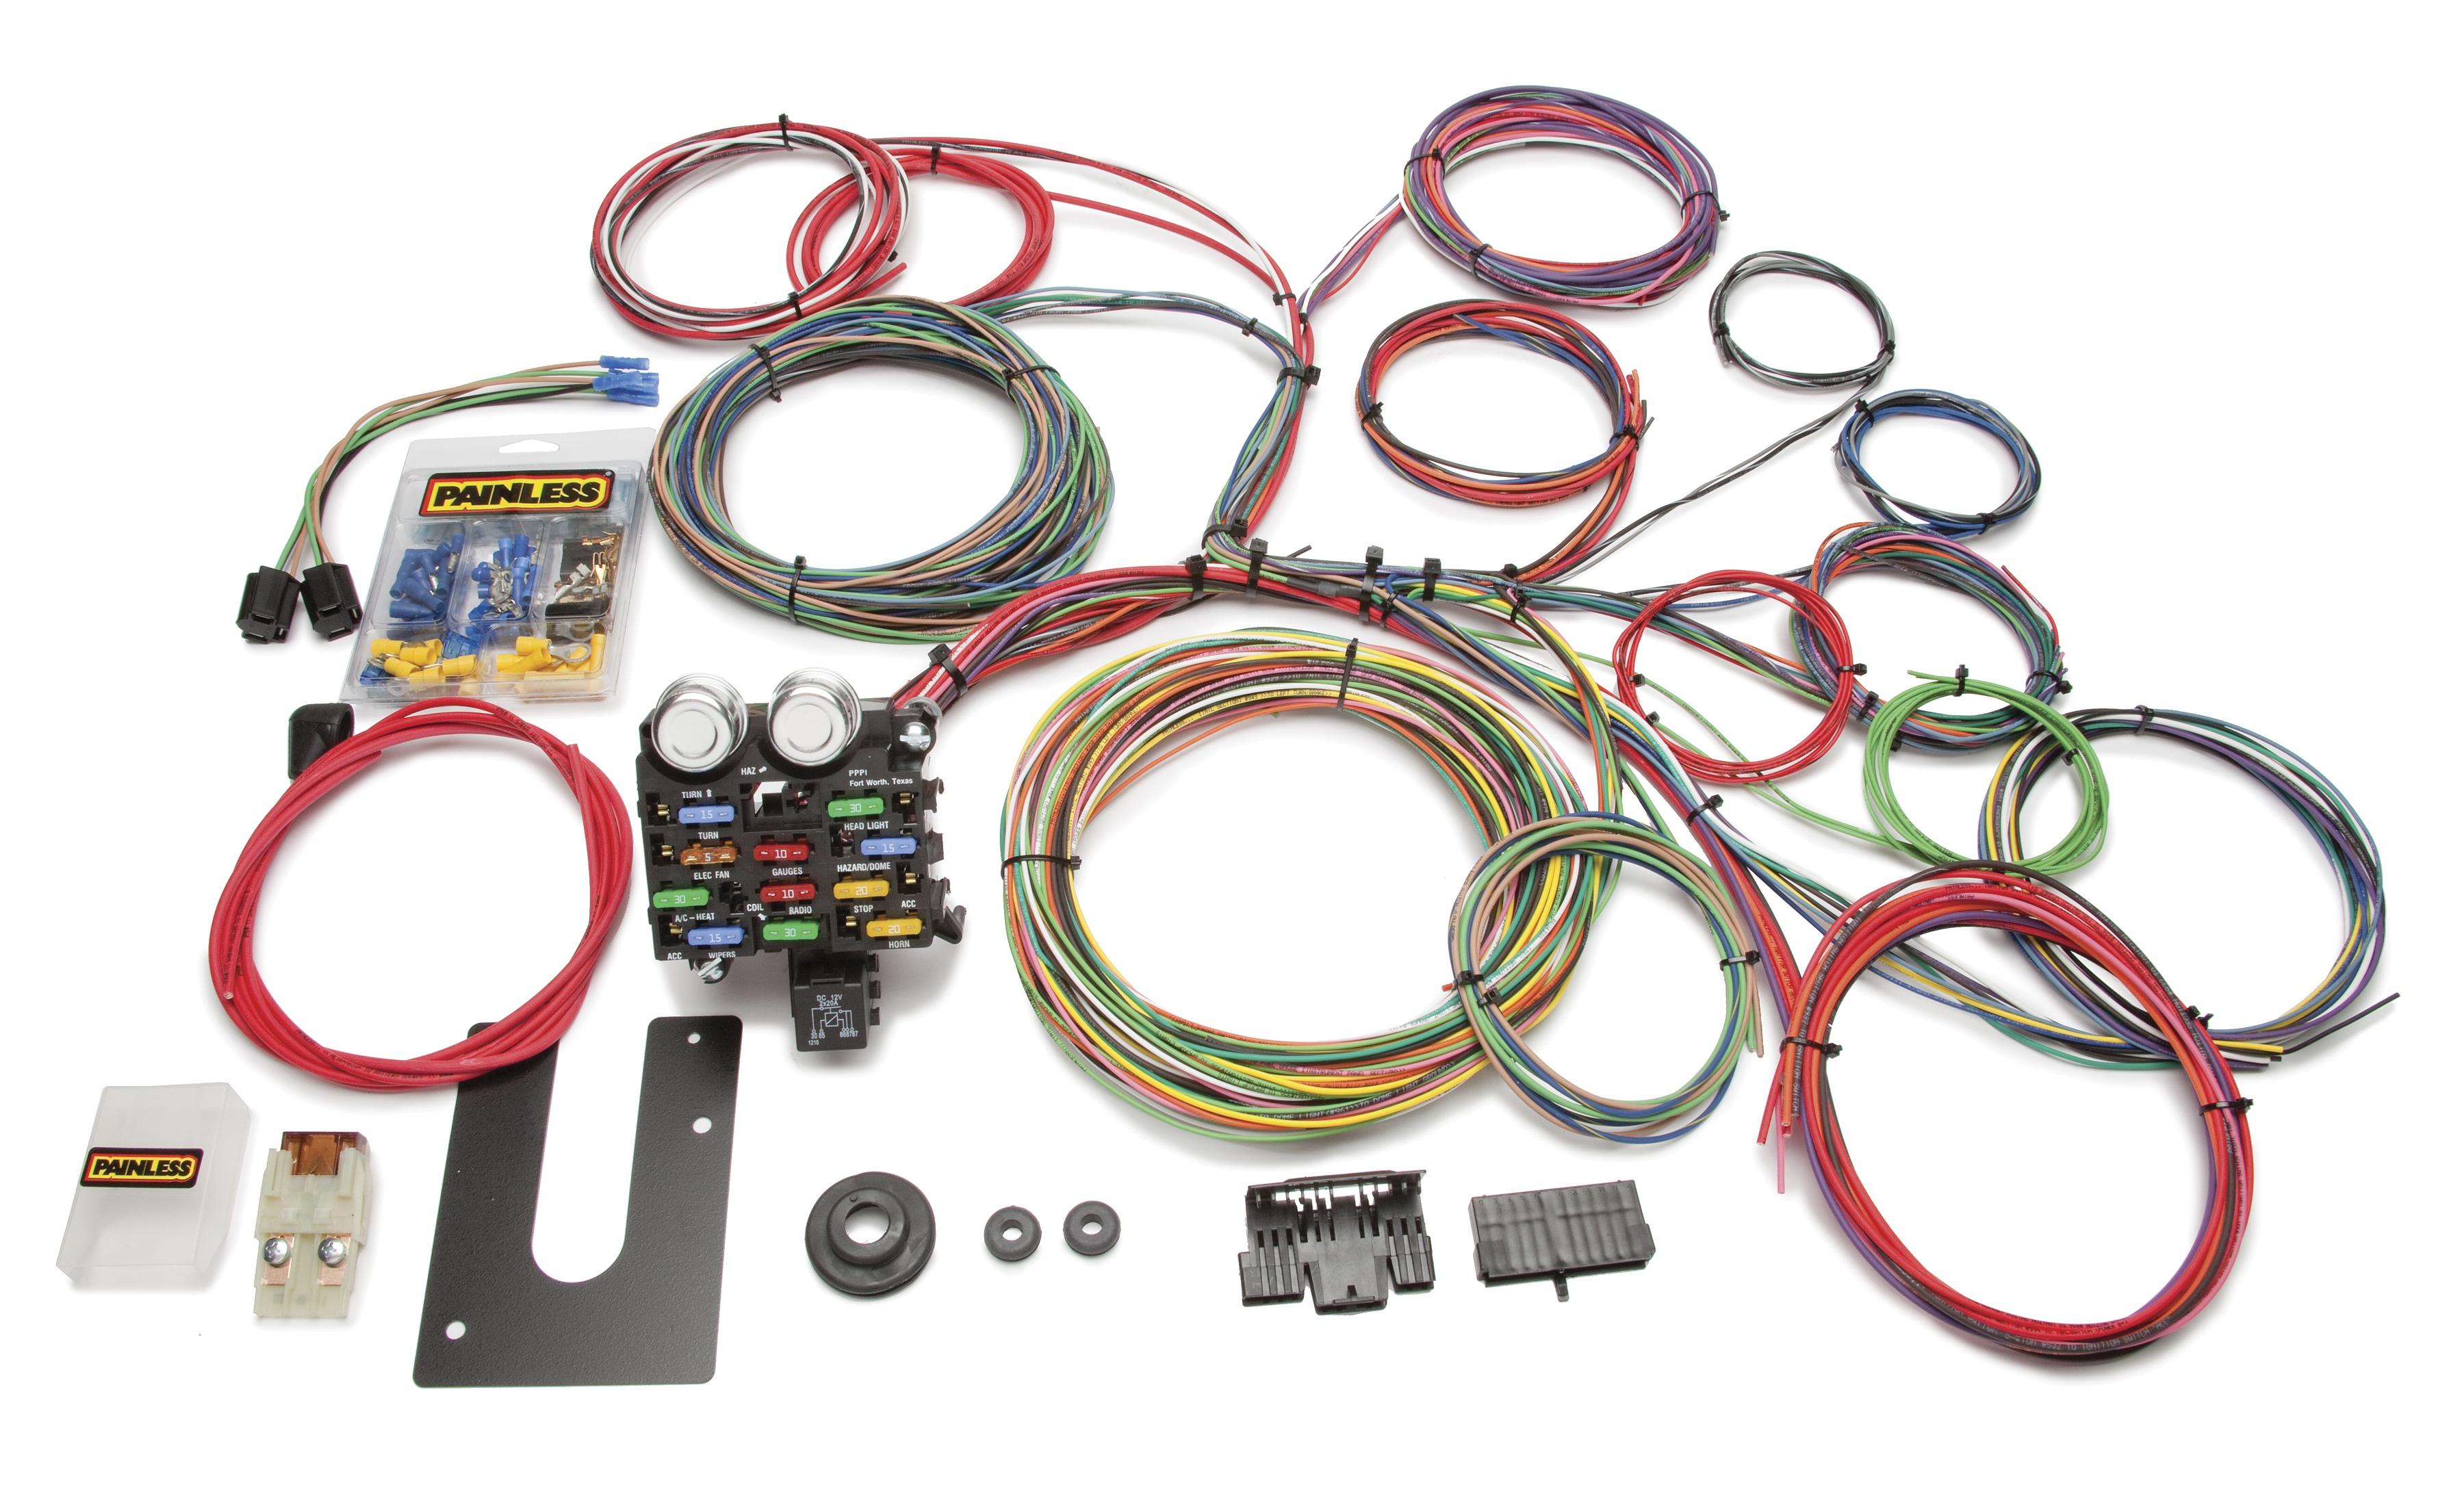 prf 10102?resize\\\=665%2C401 diagrams jeep cj8 wiring harness wiring harness question cj to centech wiring diagram bronco at eliteediting.co